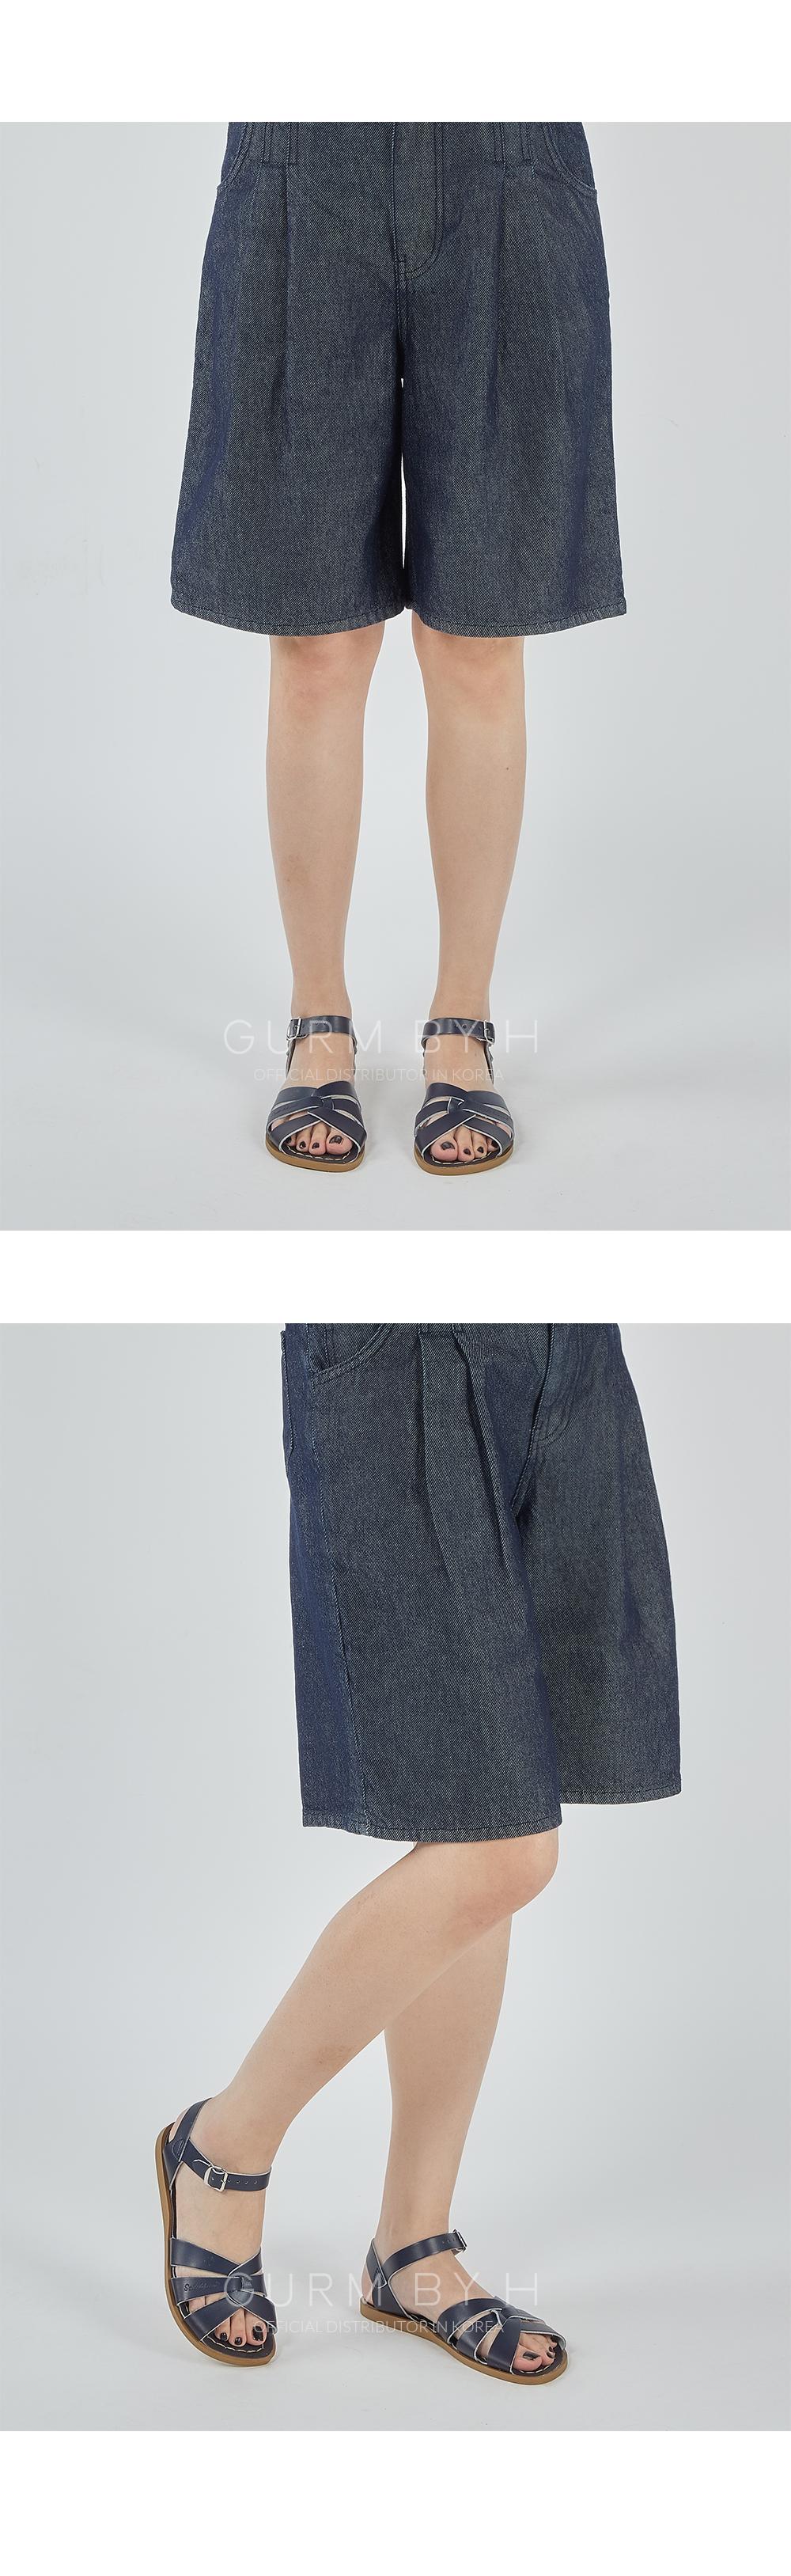 original-model-네이비